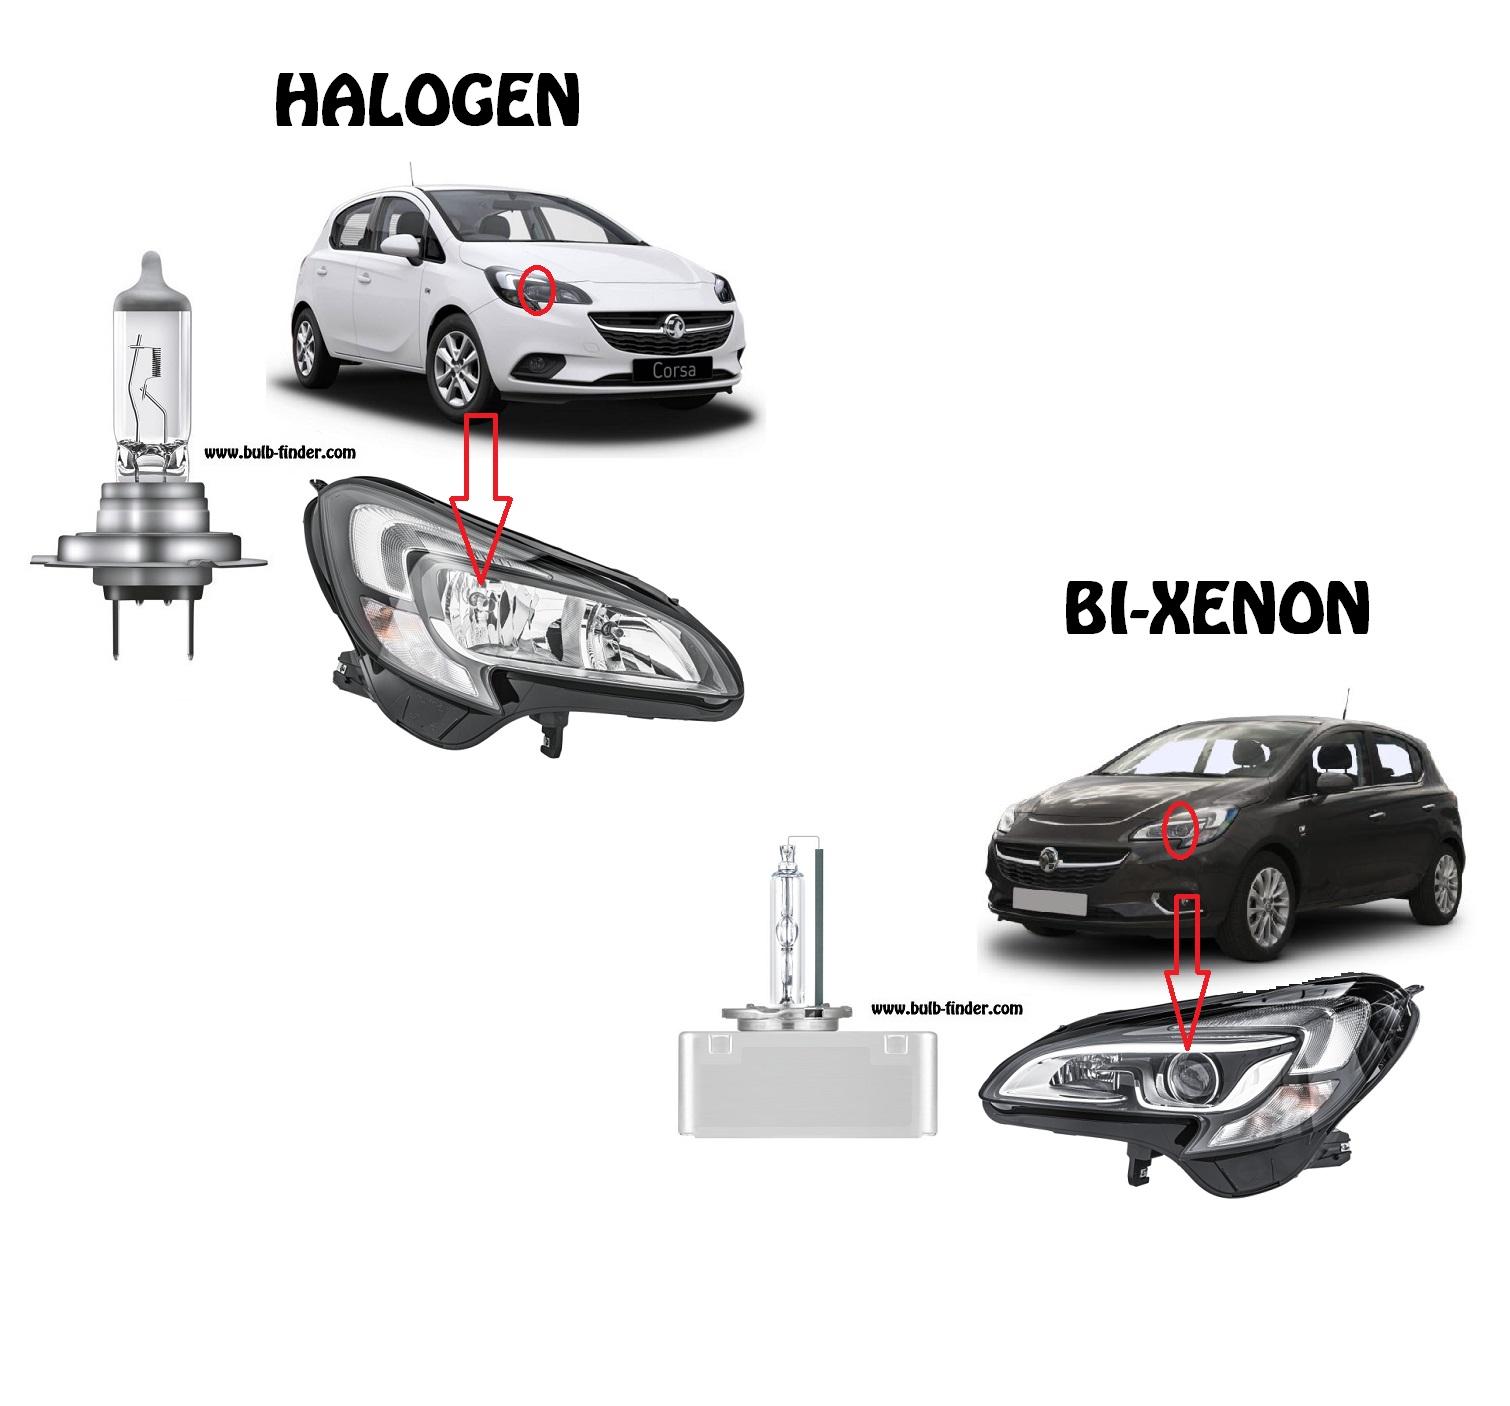 Vauxhall Corsa V bulbs specification for halogen headlamp